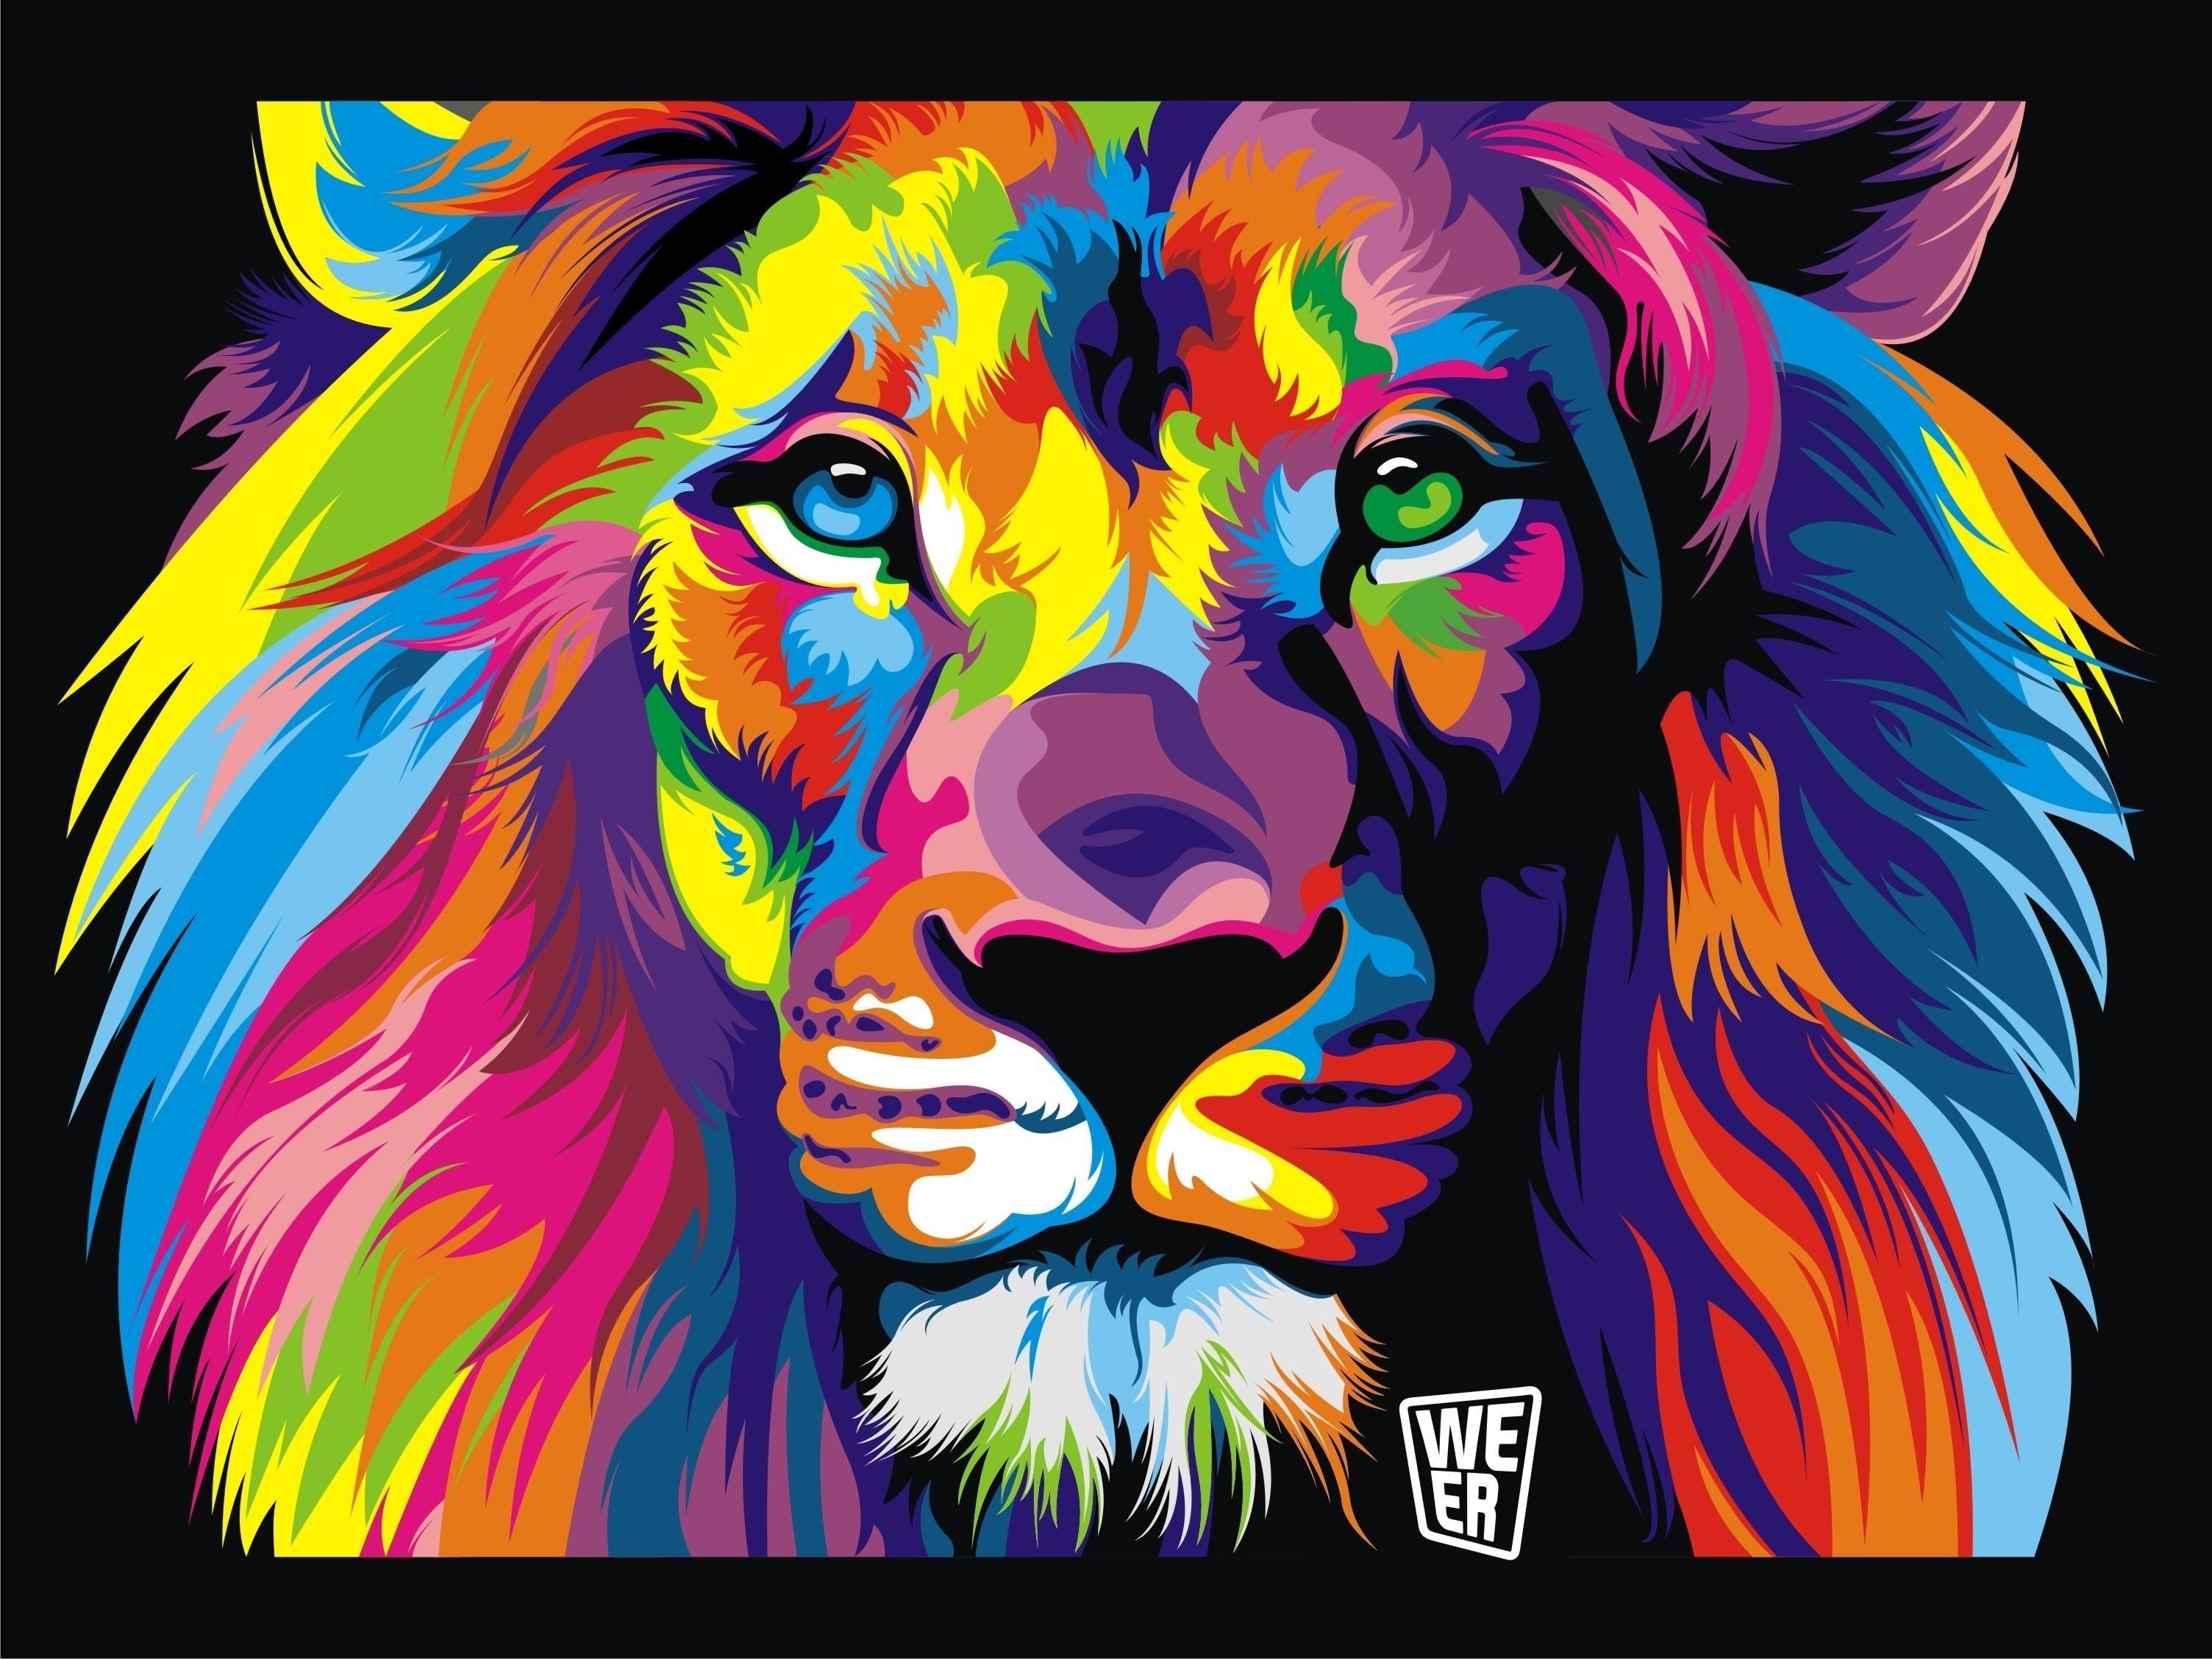 Colourful Lion Face Wallpaper | Hdwallpaperfx | Pinterest Regarding Best And Newest Abstract Lion Wall Art (View 18 of 20)